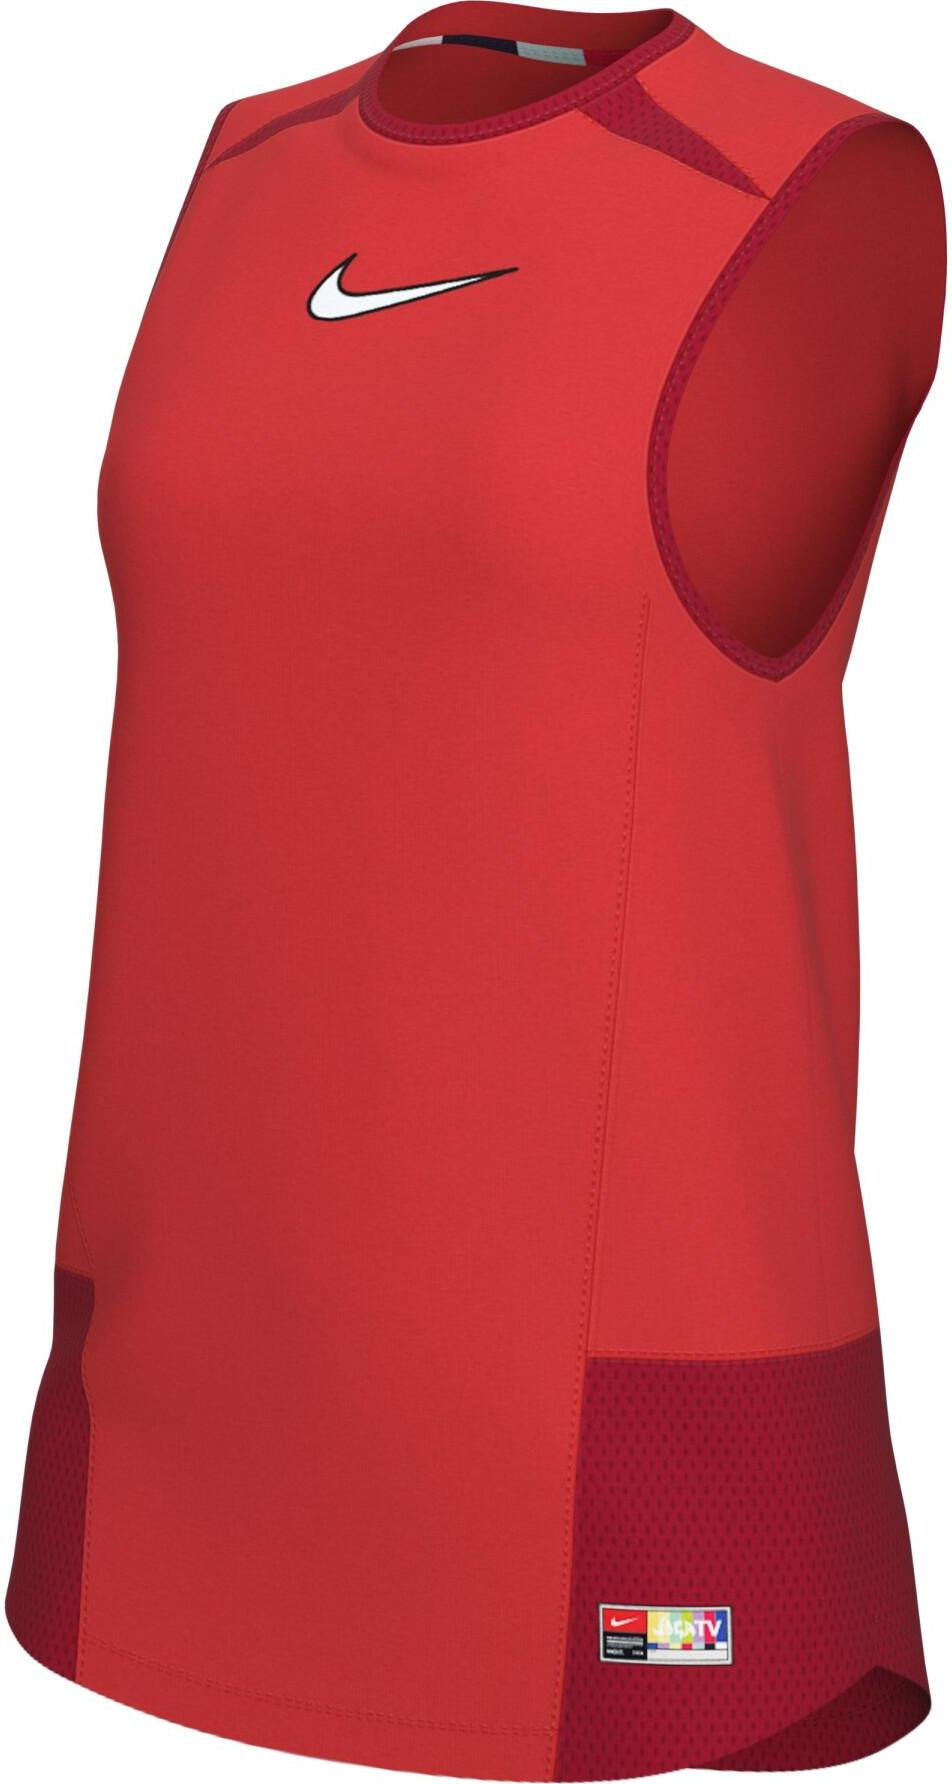 Triko Nike  F.C. Dri-FIT Women s Sleeveless Soccer Top